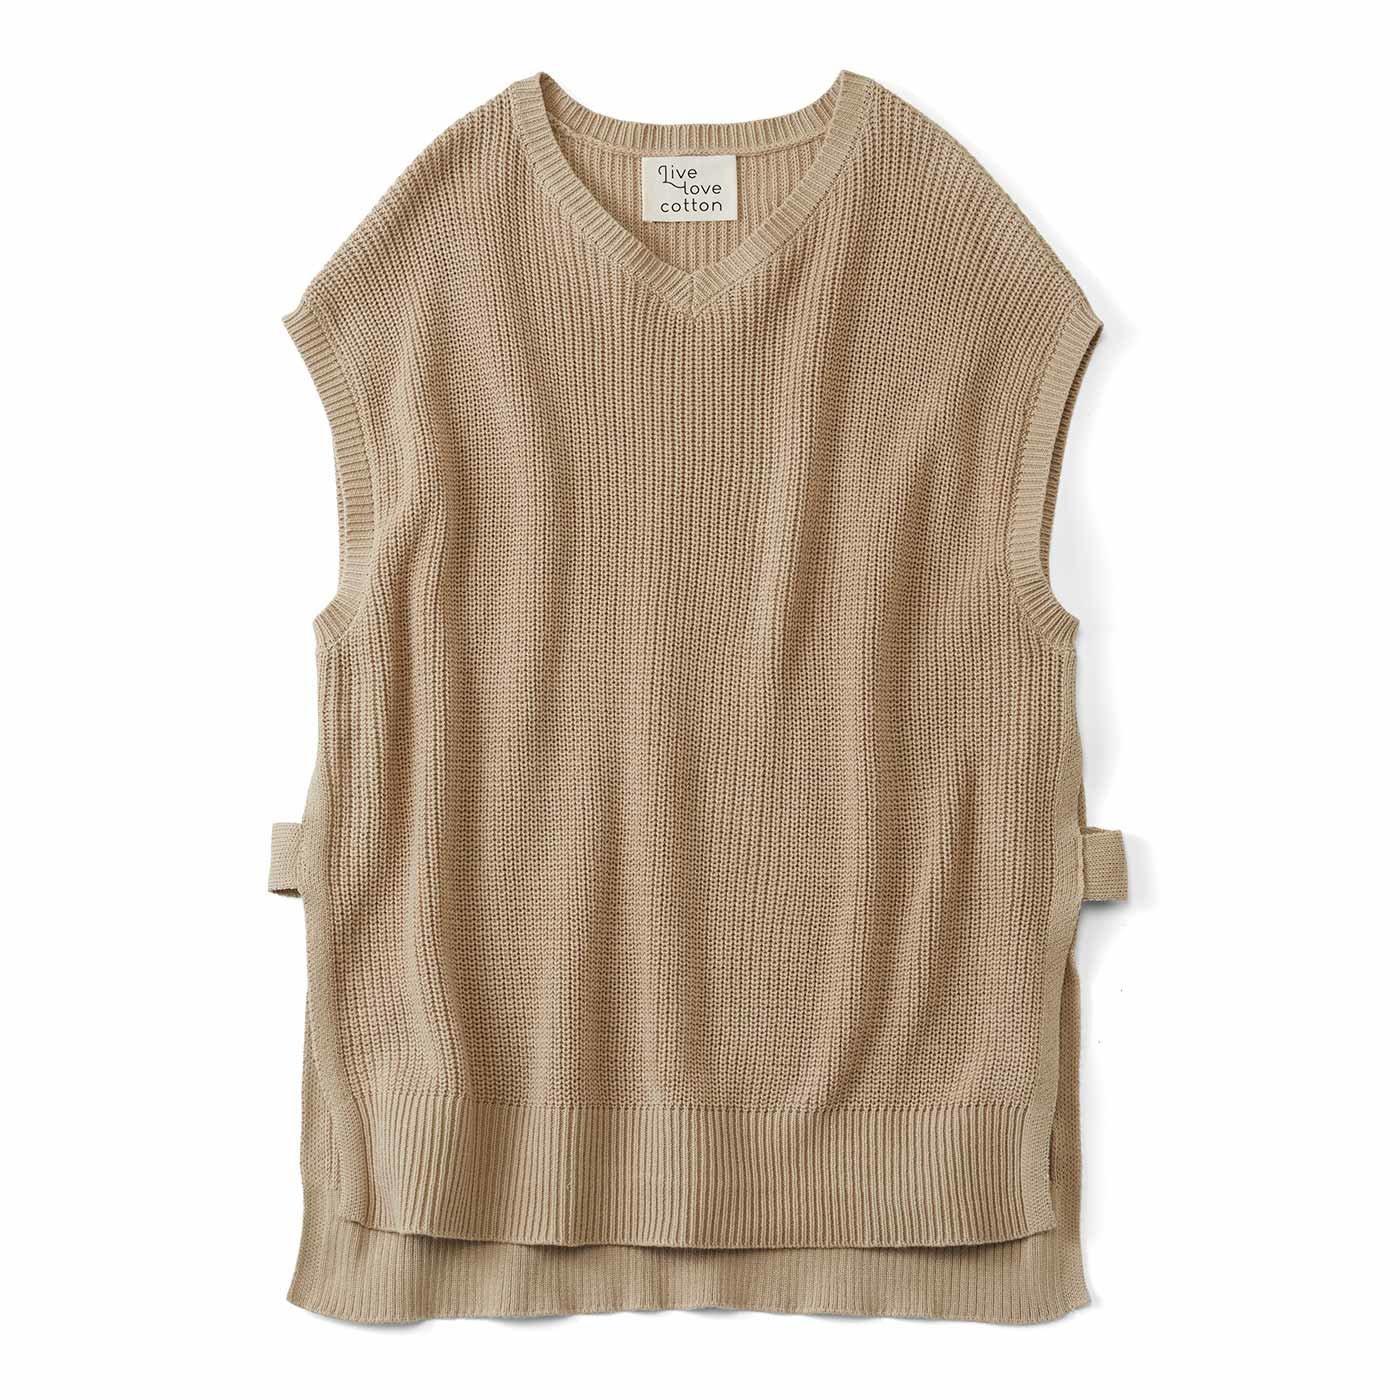 Live love cottonプロジェクト リブ イン コンフォート パサッと着て素敵なやわらかオーガニックコットンニットベスト〈ベージュ〉